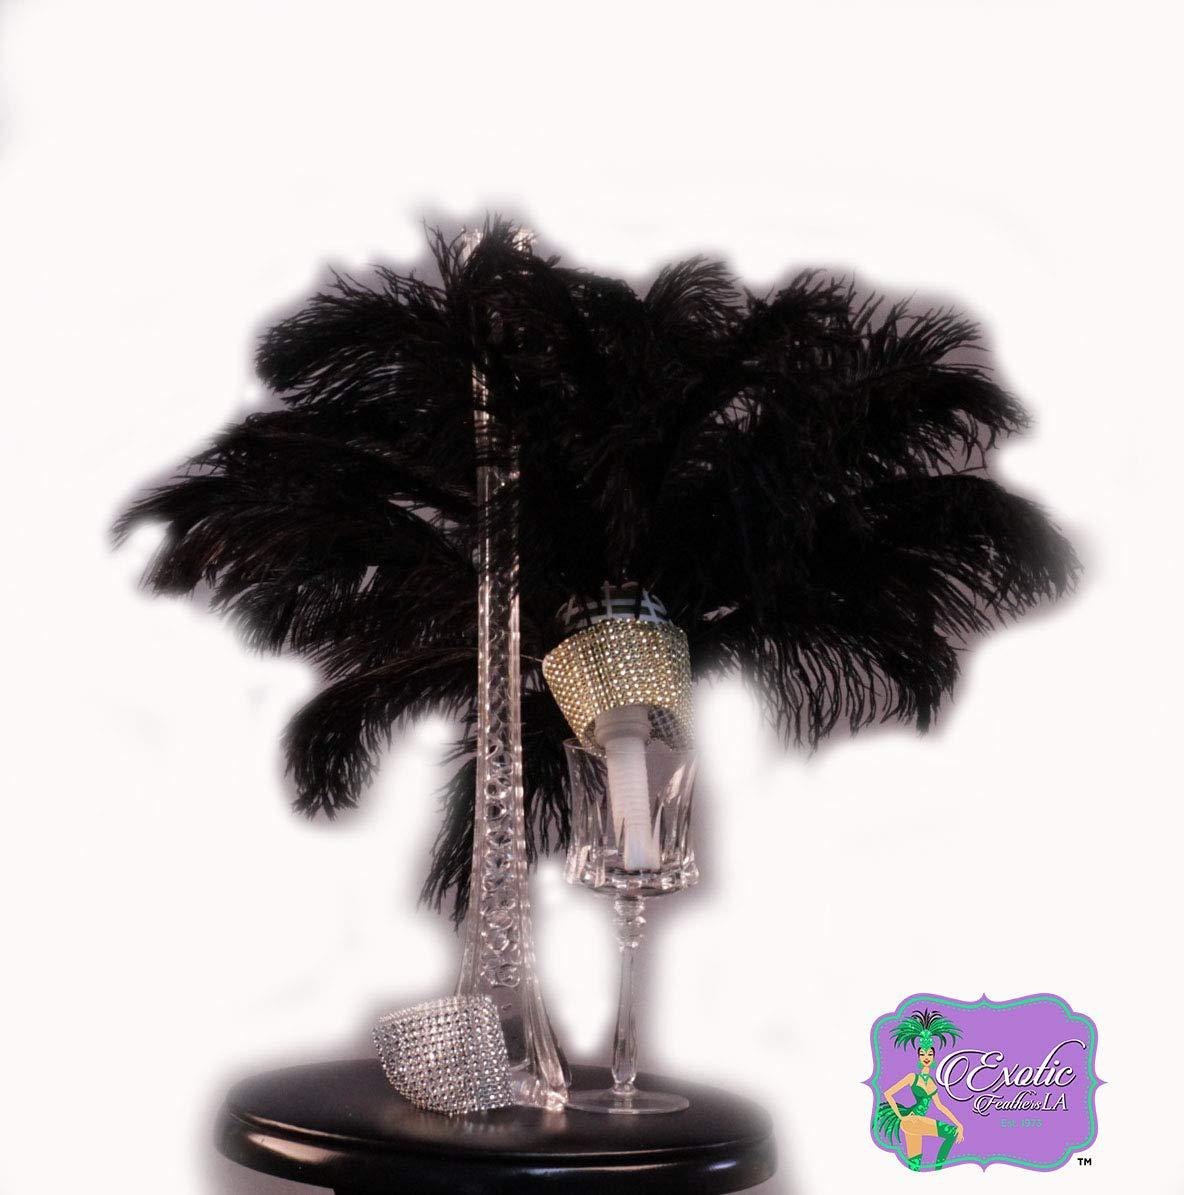 Special Sale 100 Pcs. BLACK OSTRICH Feathers Wholesale Bulk 13/18'' long DELUXE FEATHERS by Exotic Feathers LA est. 1973 (Image #4)